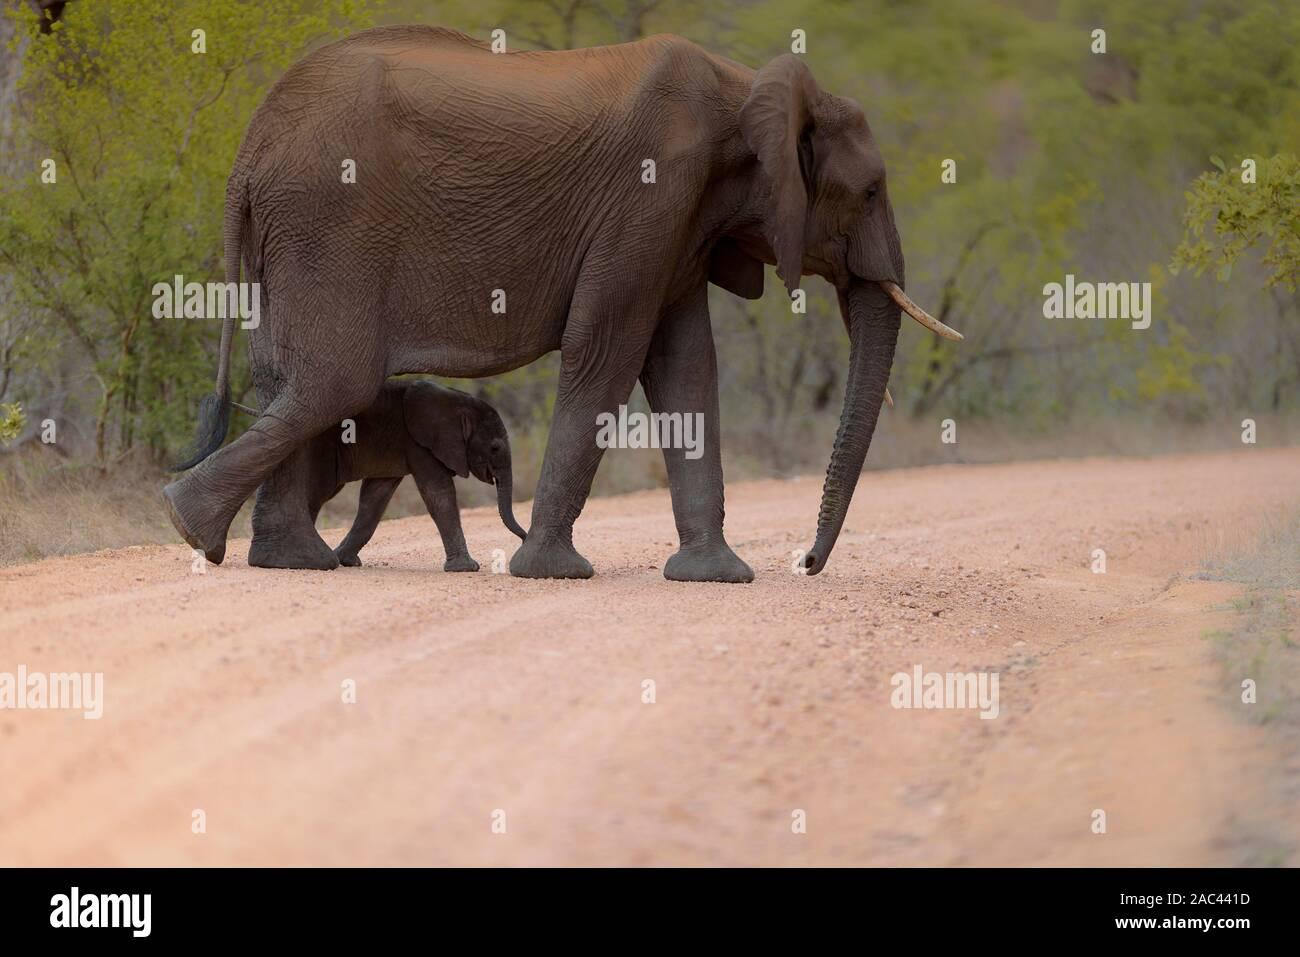 Elephant portrait African elephant Stock Photo